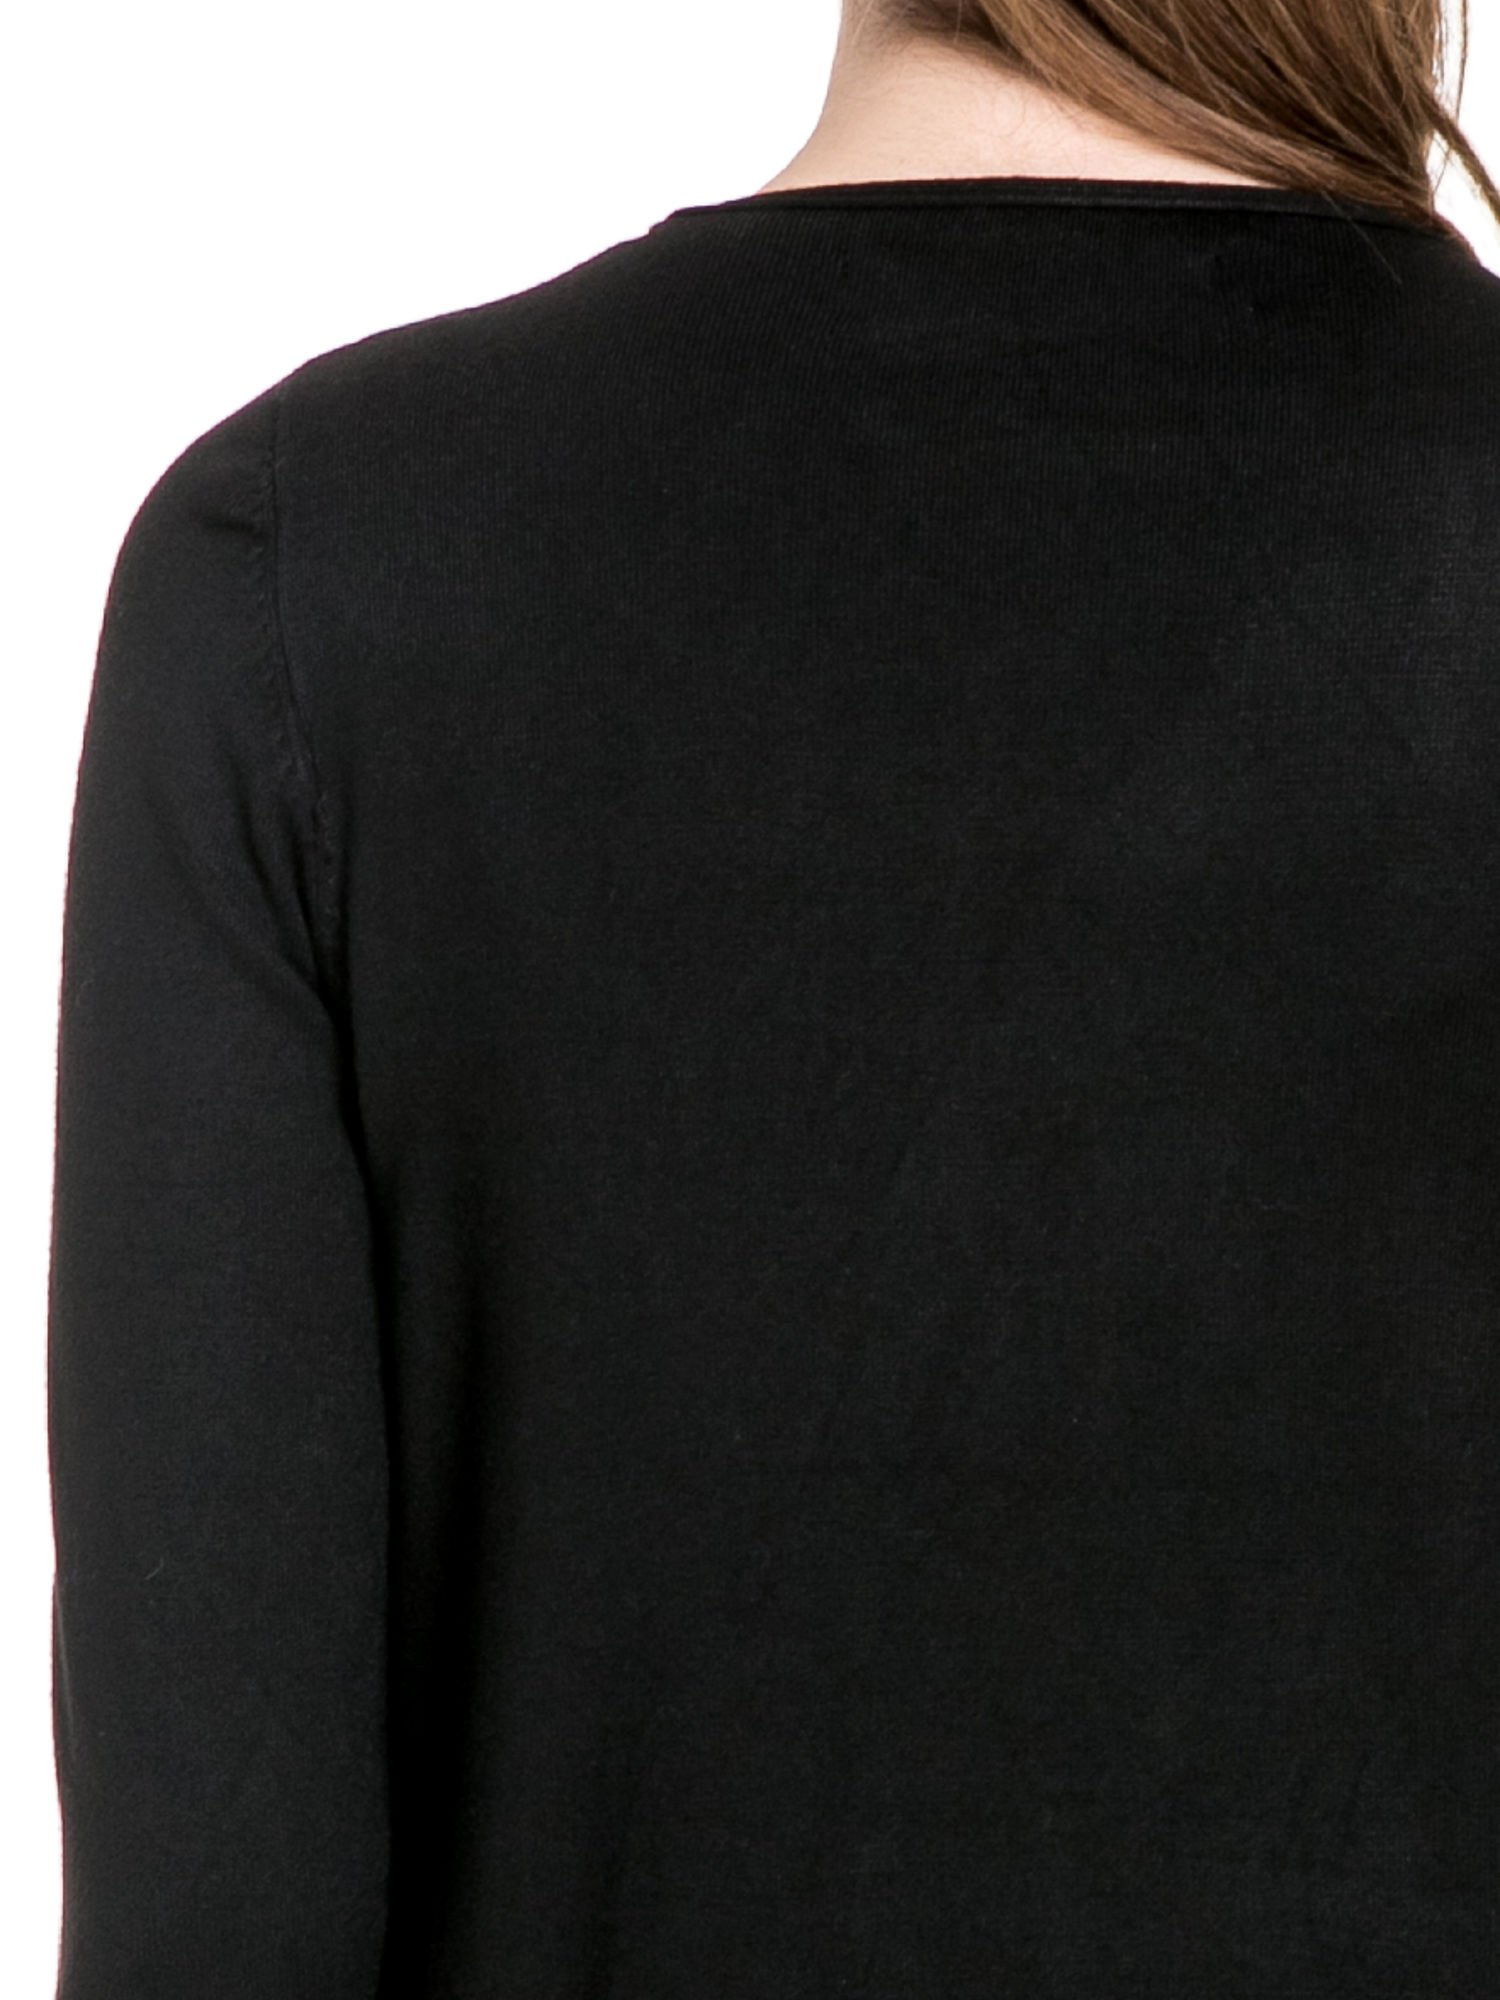 Czarny sweter narzutka o kroju waterfall                                  zdj.                                  7